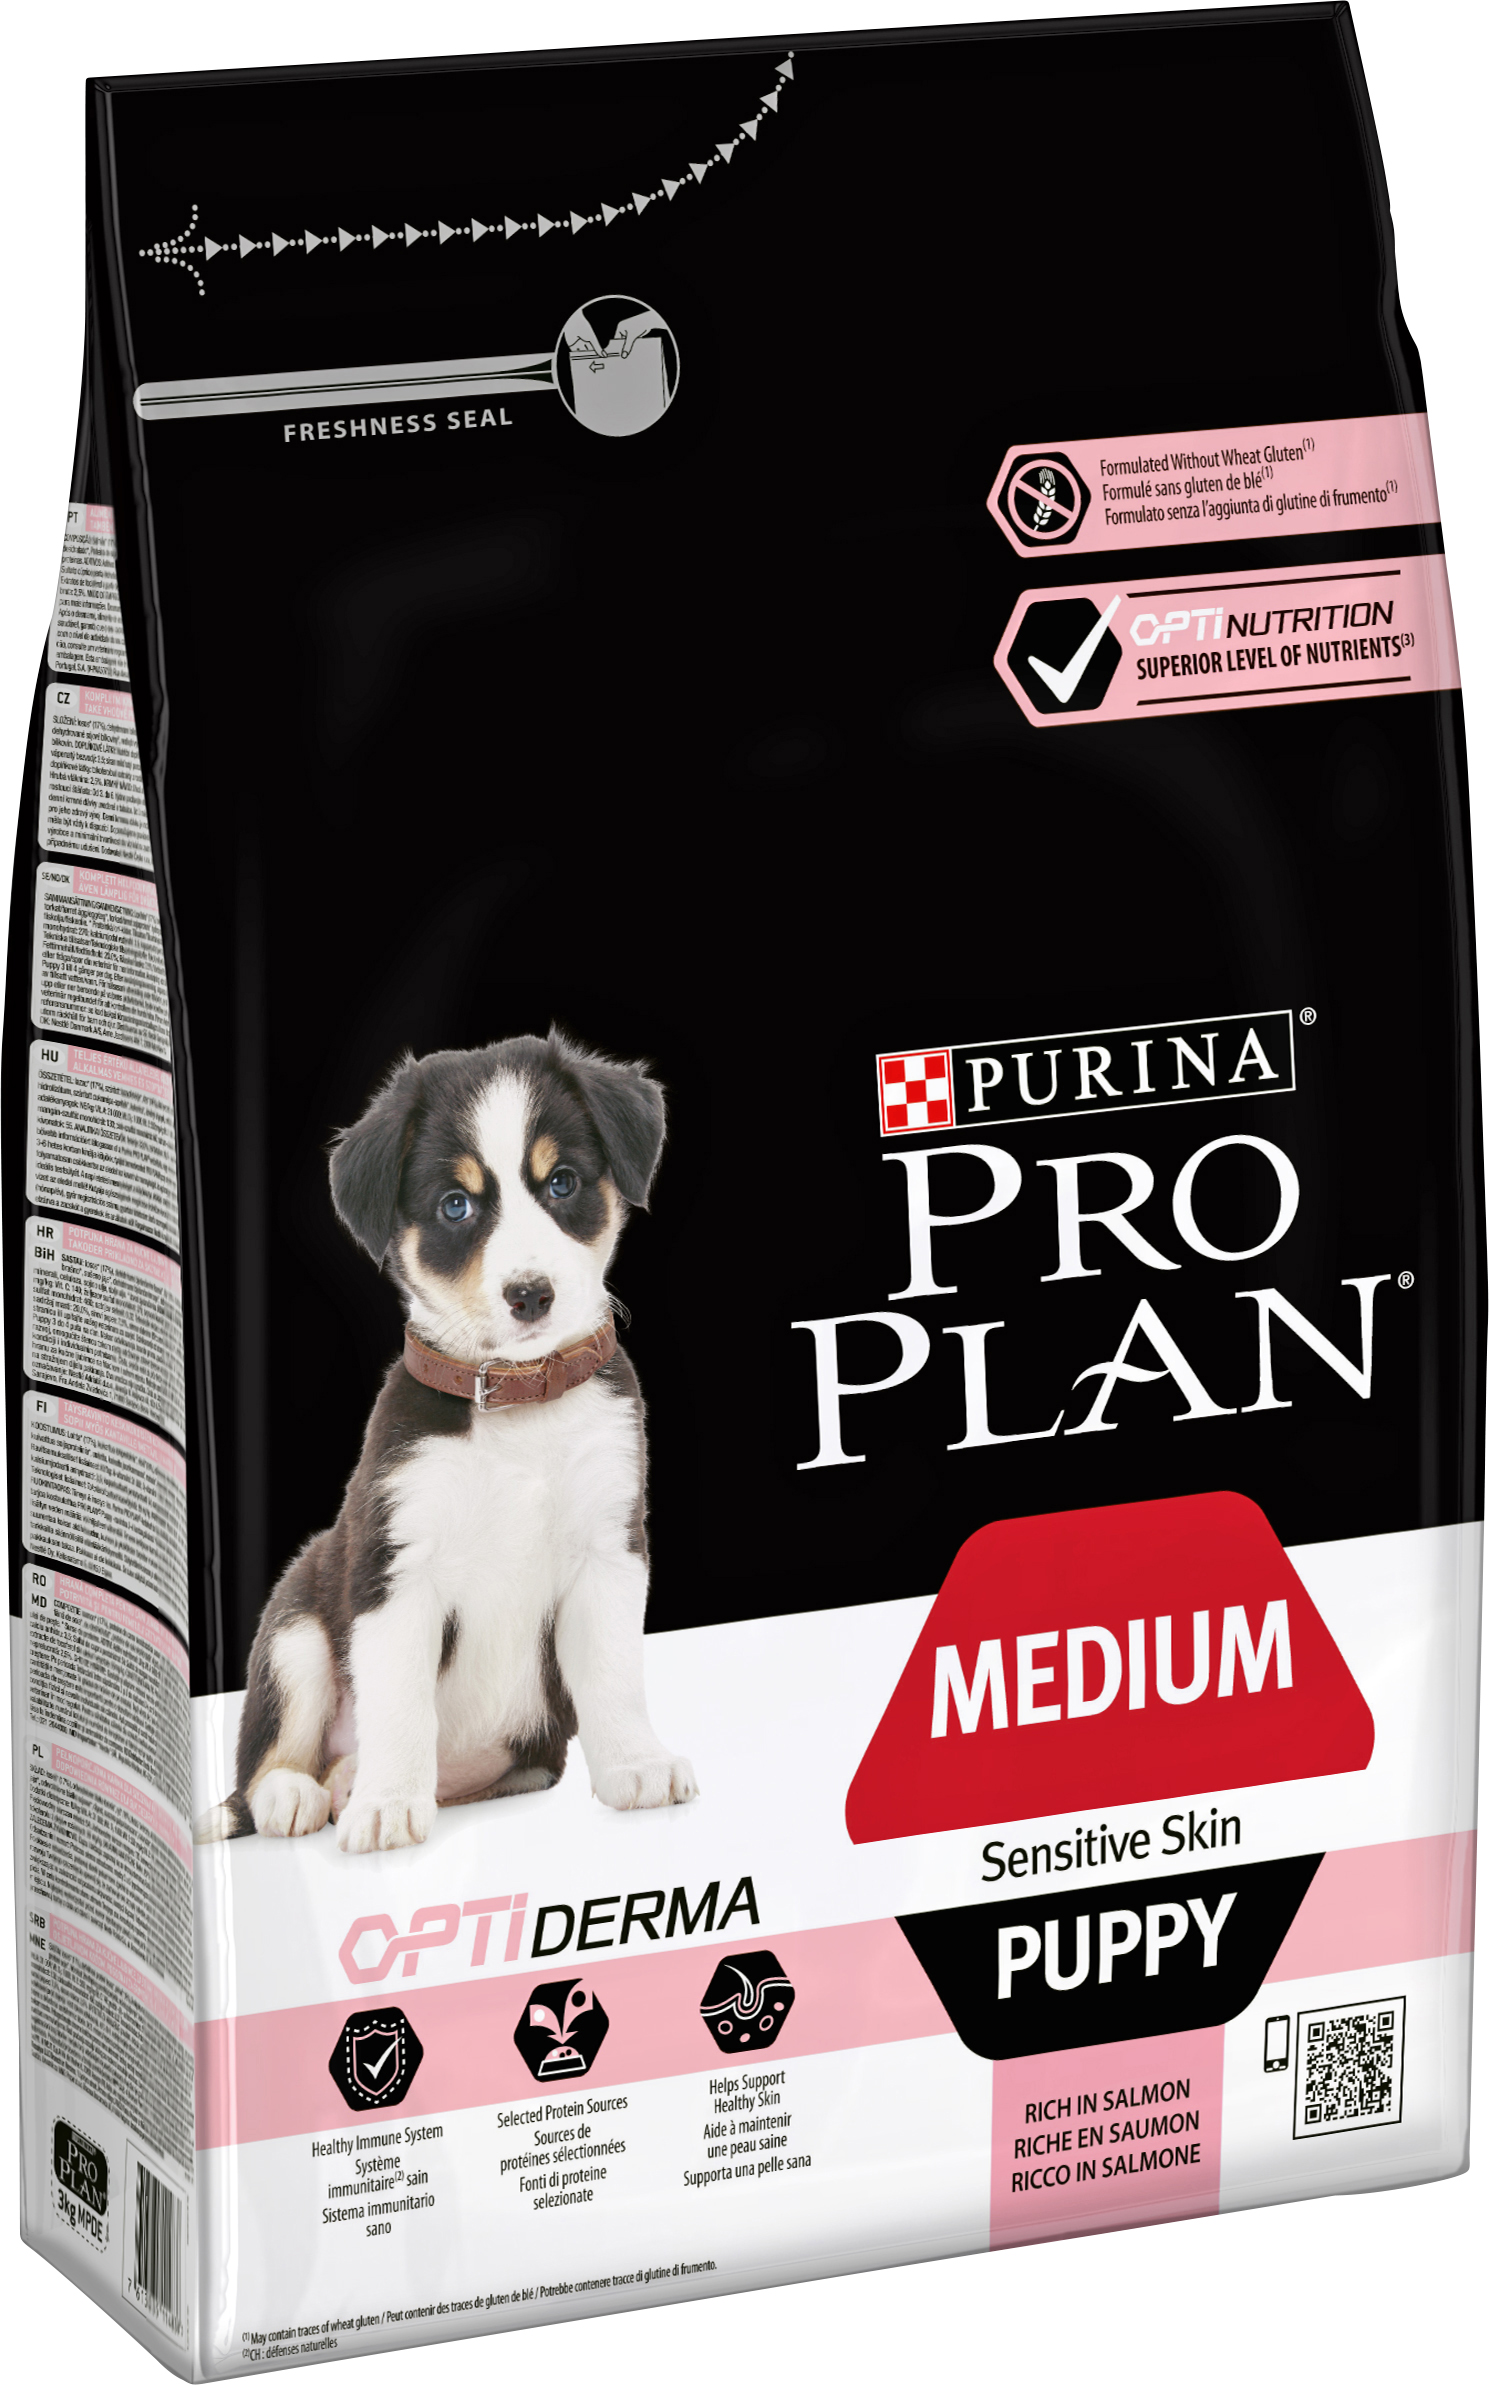 Hundfoder Pro Plan Medium Puppy Sensitive Skin, 3 kg